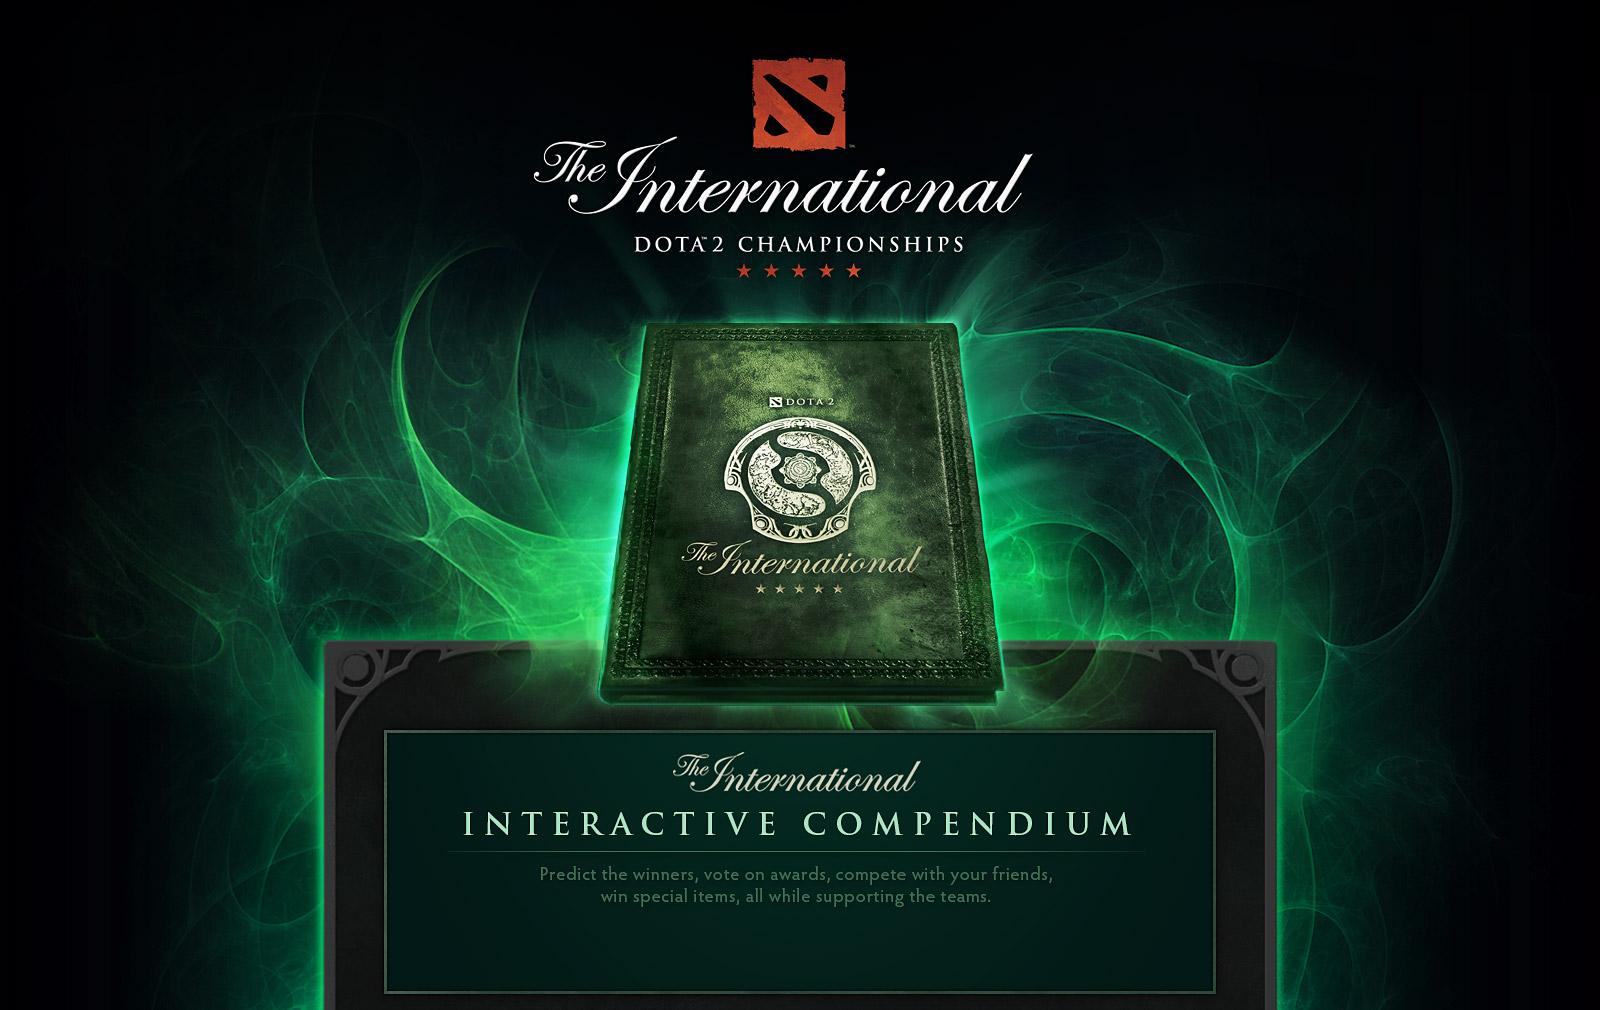 The Interactive Compendium